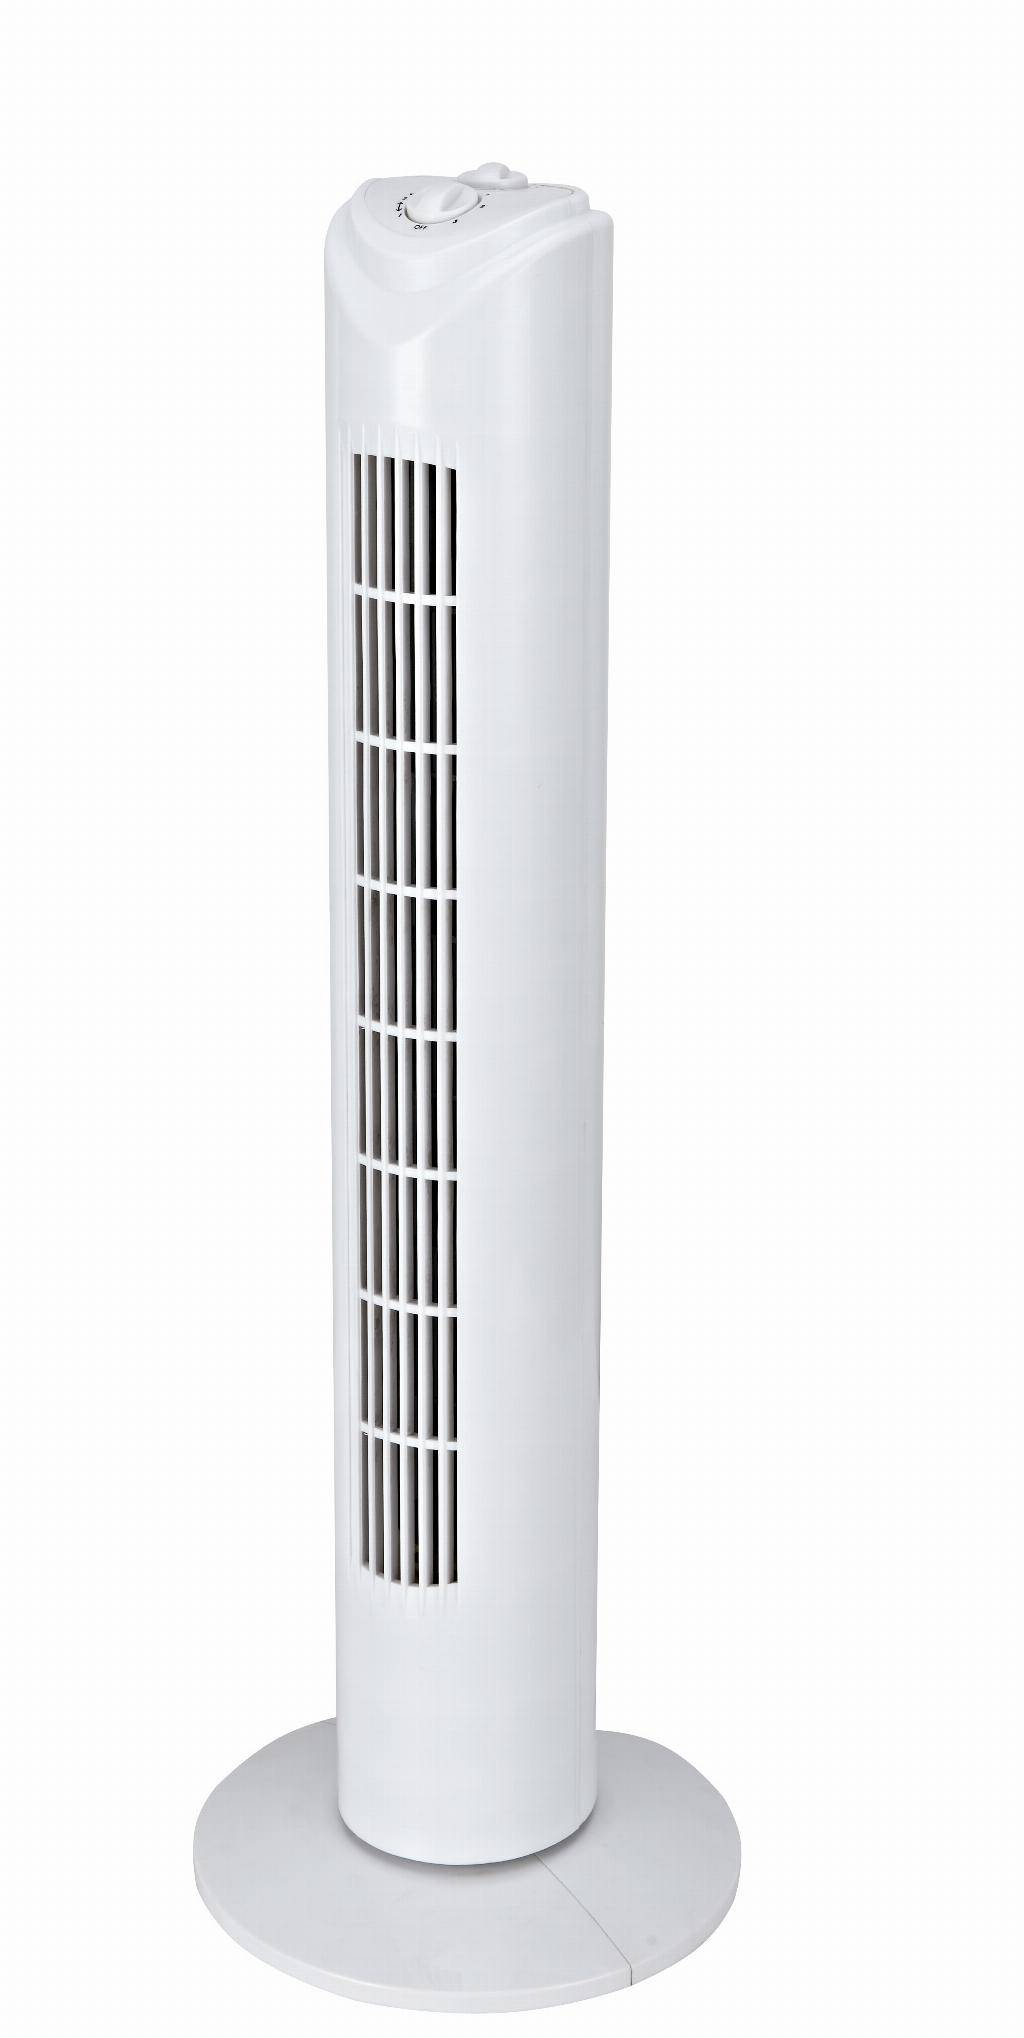 zephir ventilatore a colonna basico con timer h 80 cm